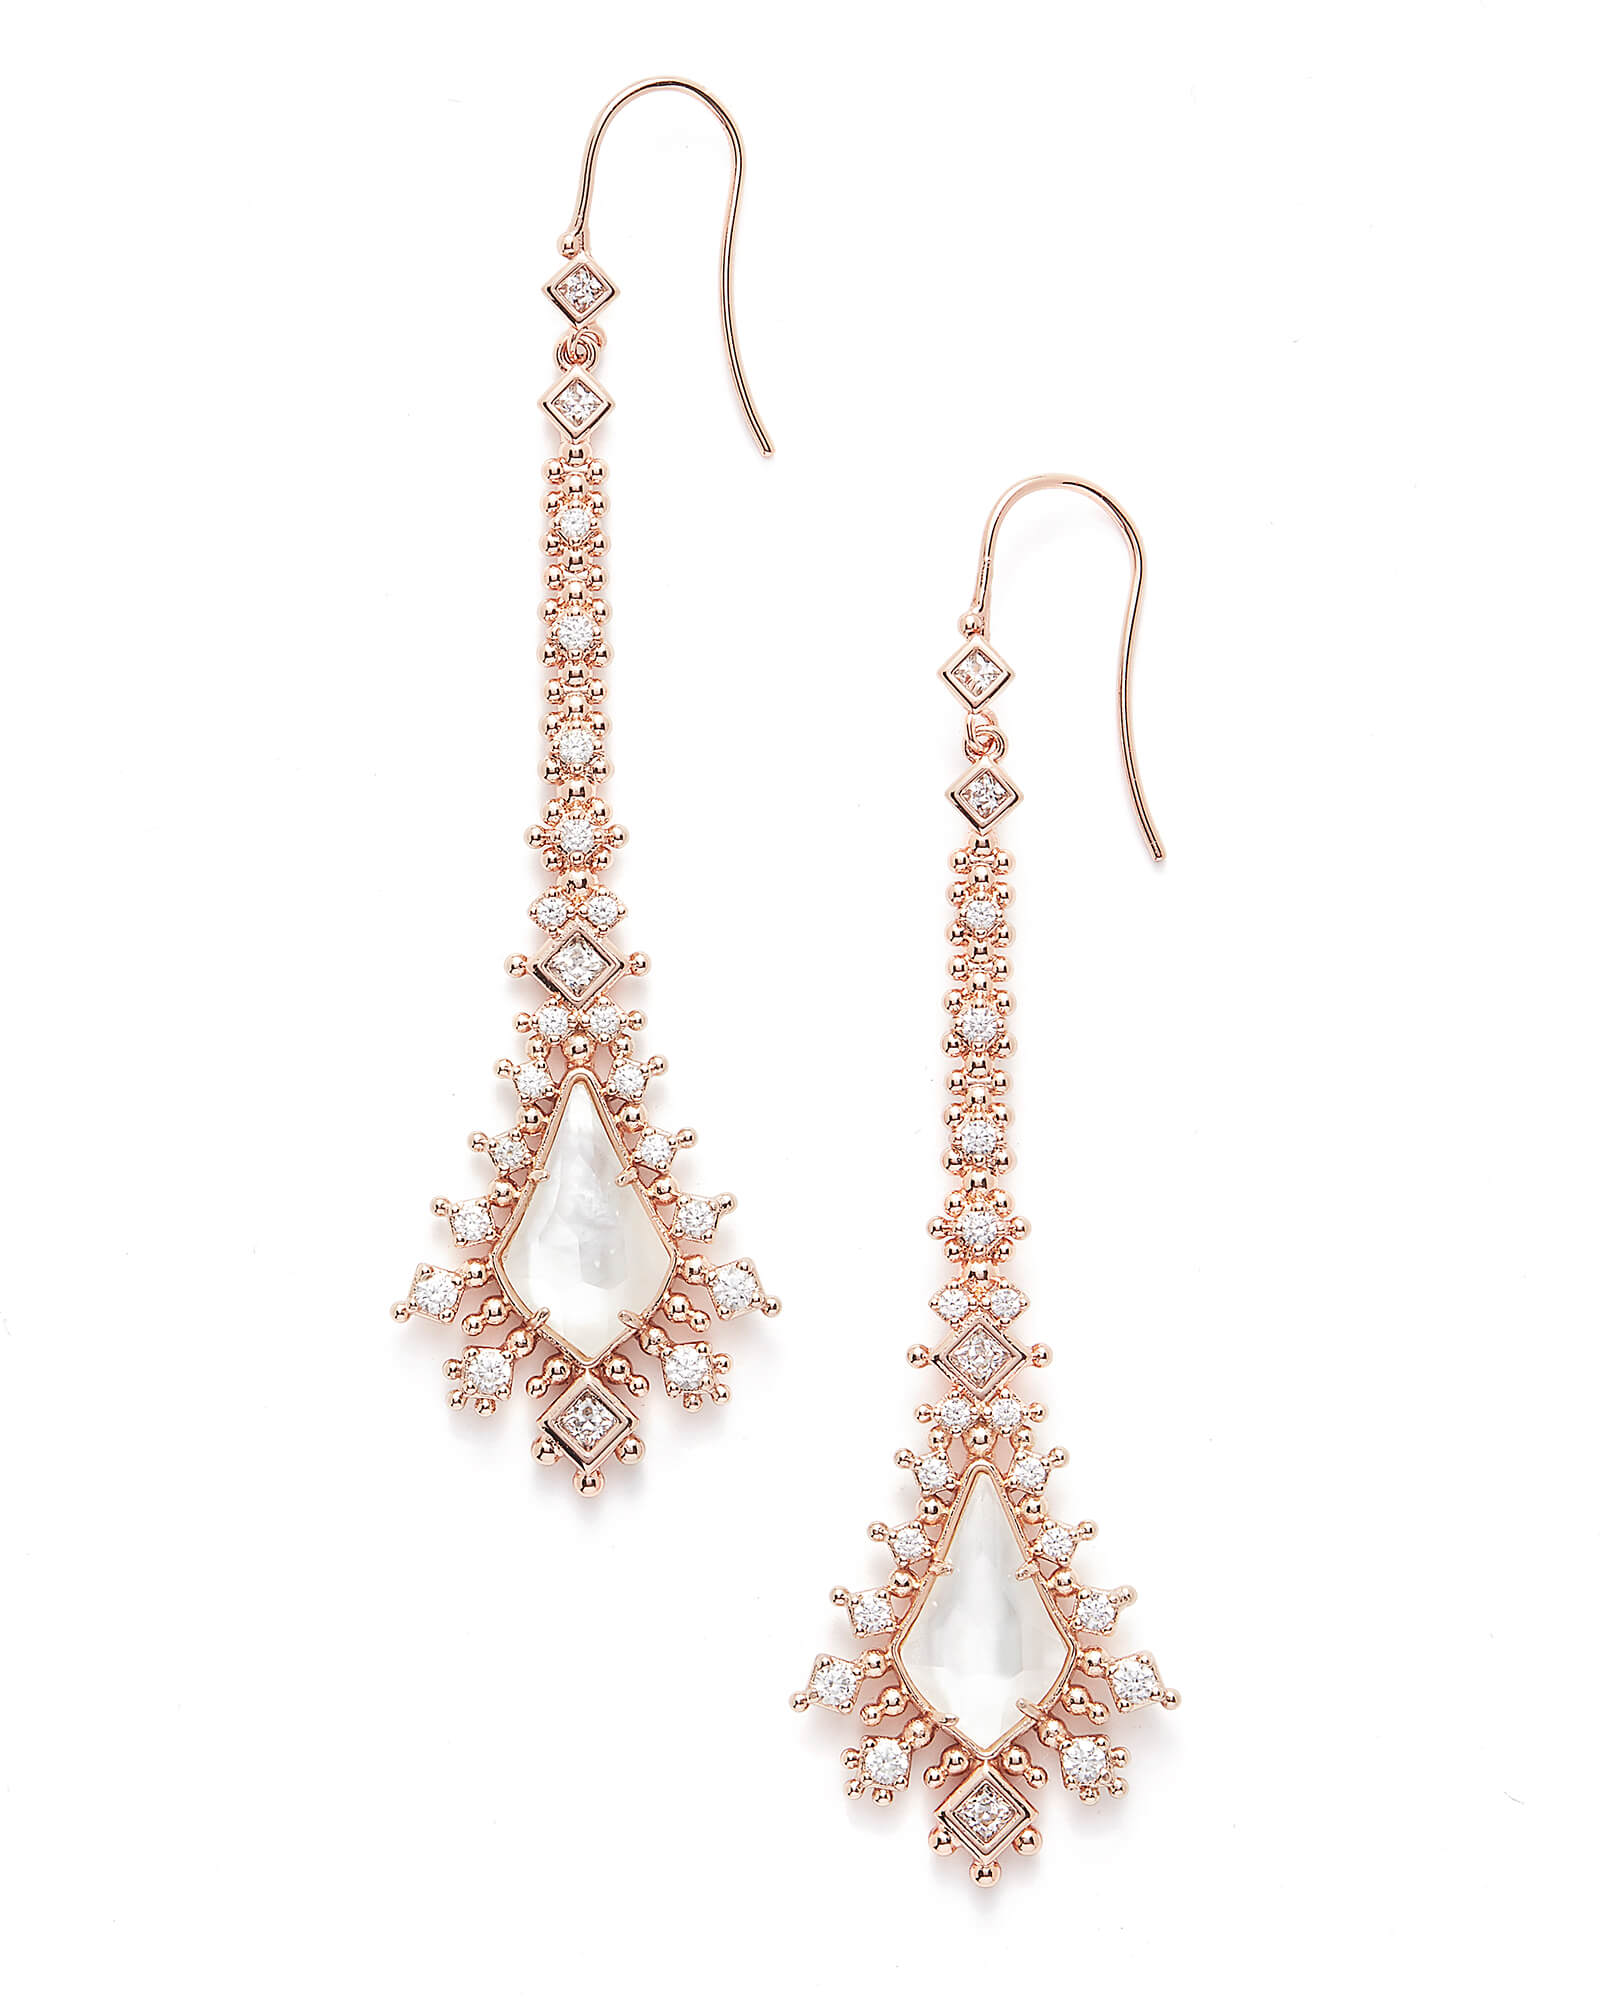 db4dfcfe2 Reimer Statement Earrings in Rose Gold   Kendra Scott Bridal